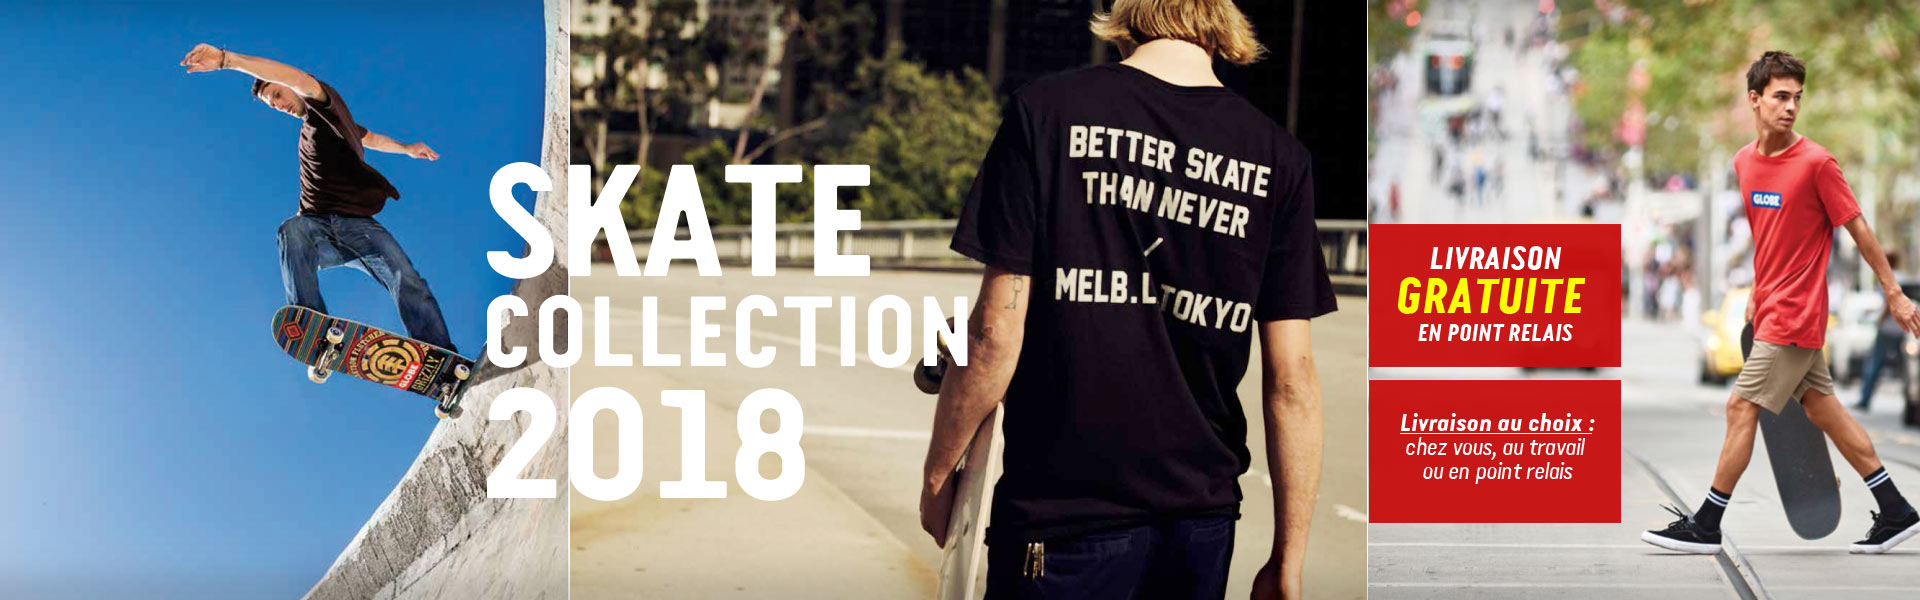 skate2018